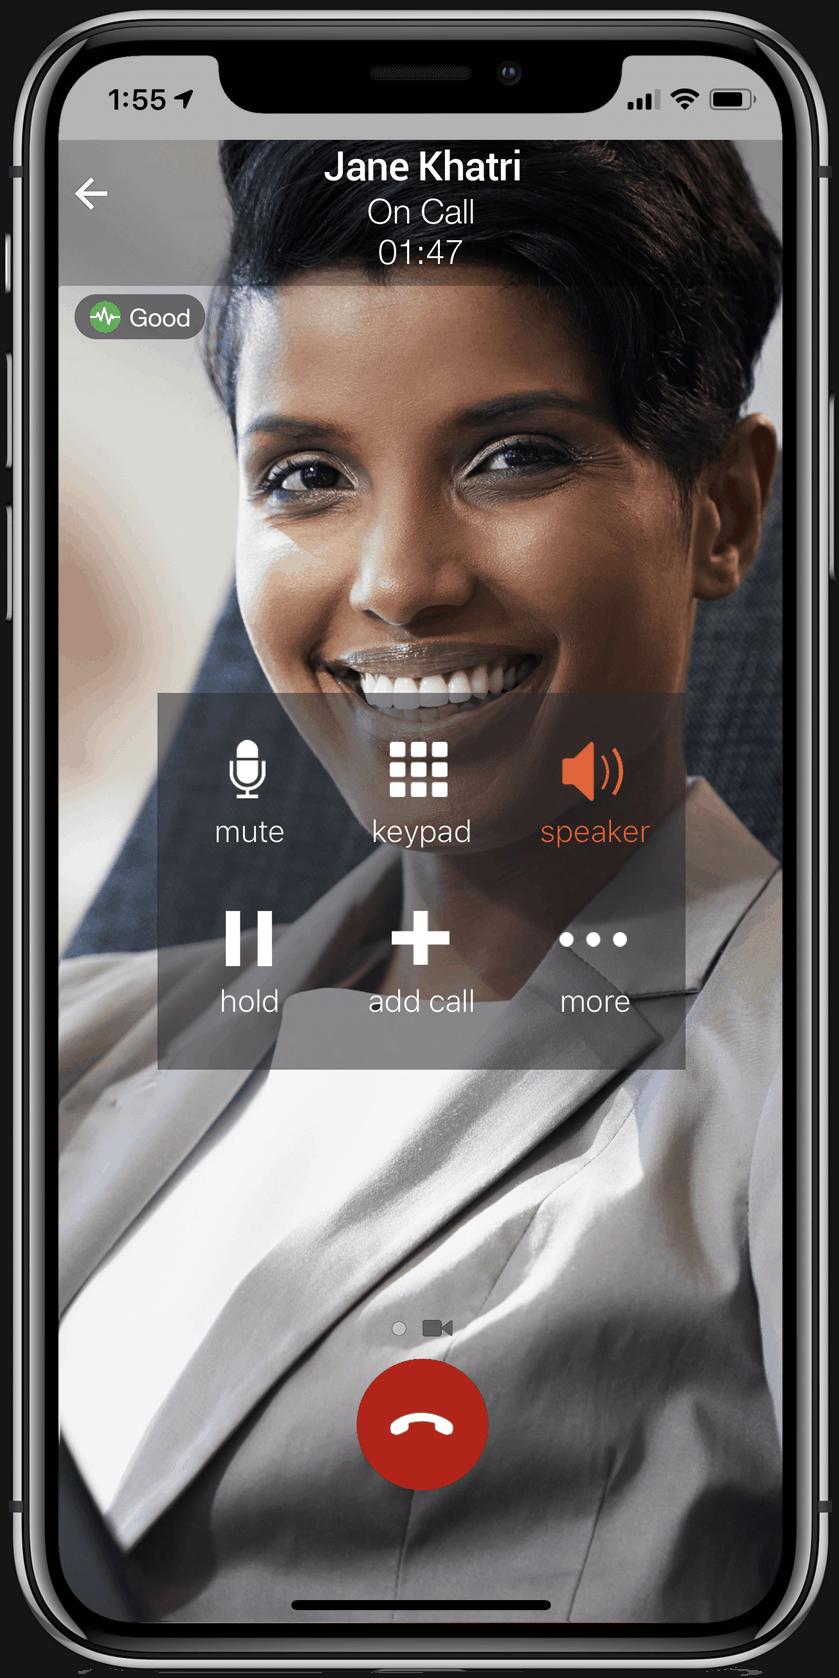 Video iPhone X Cloud Based PBX Phone System